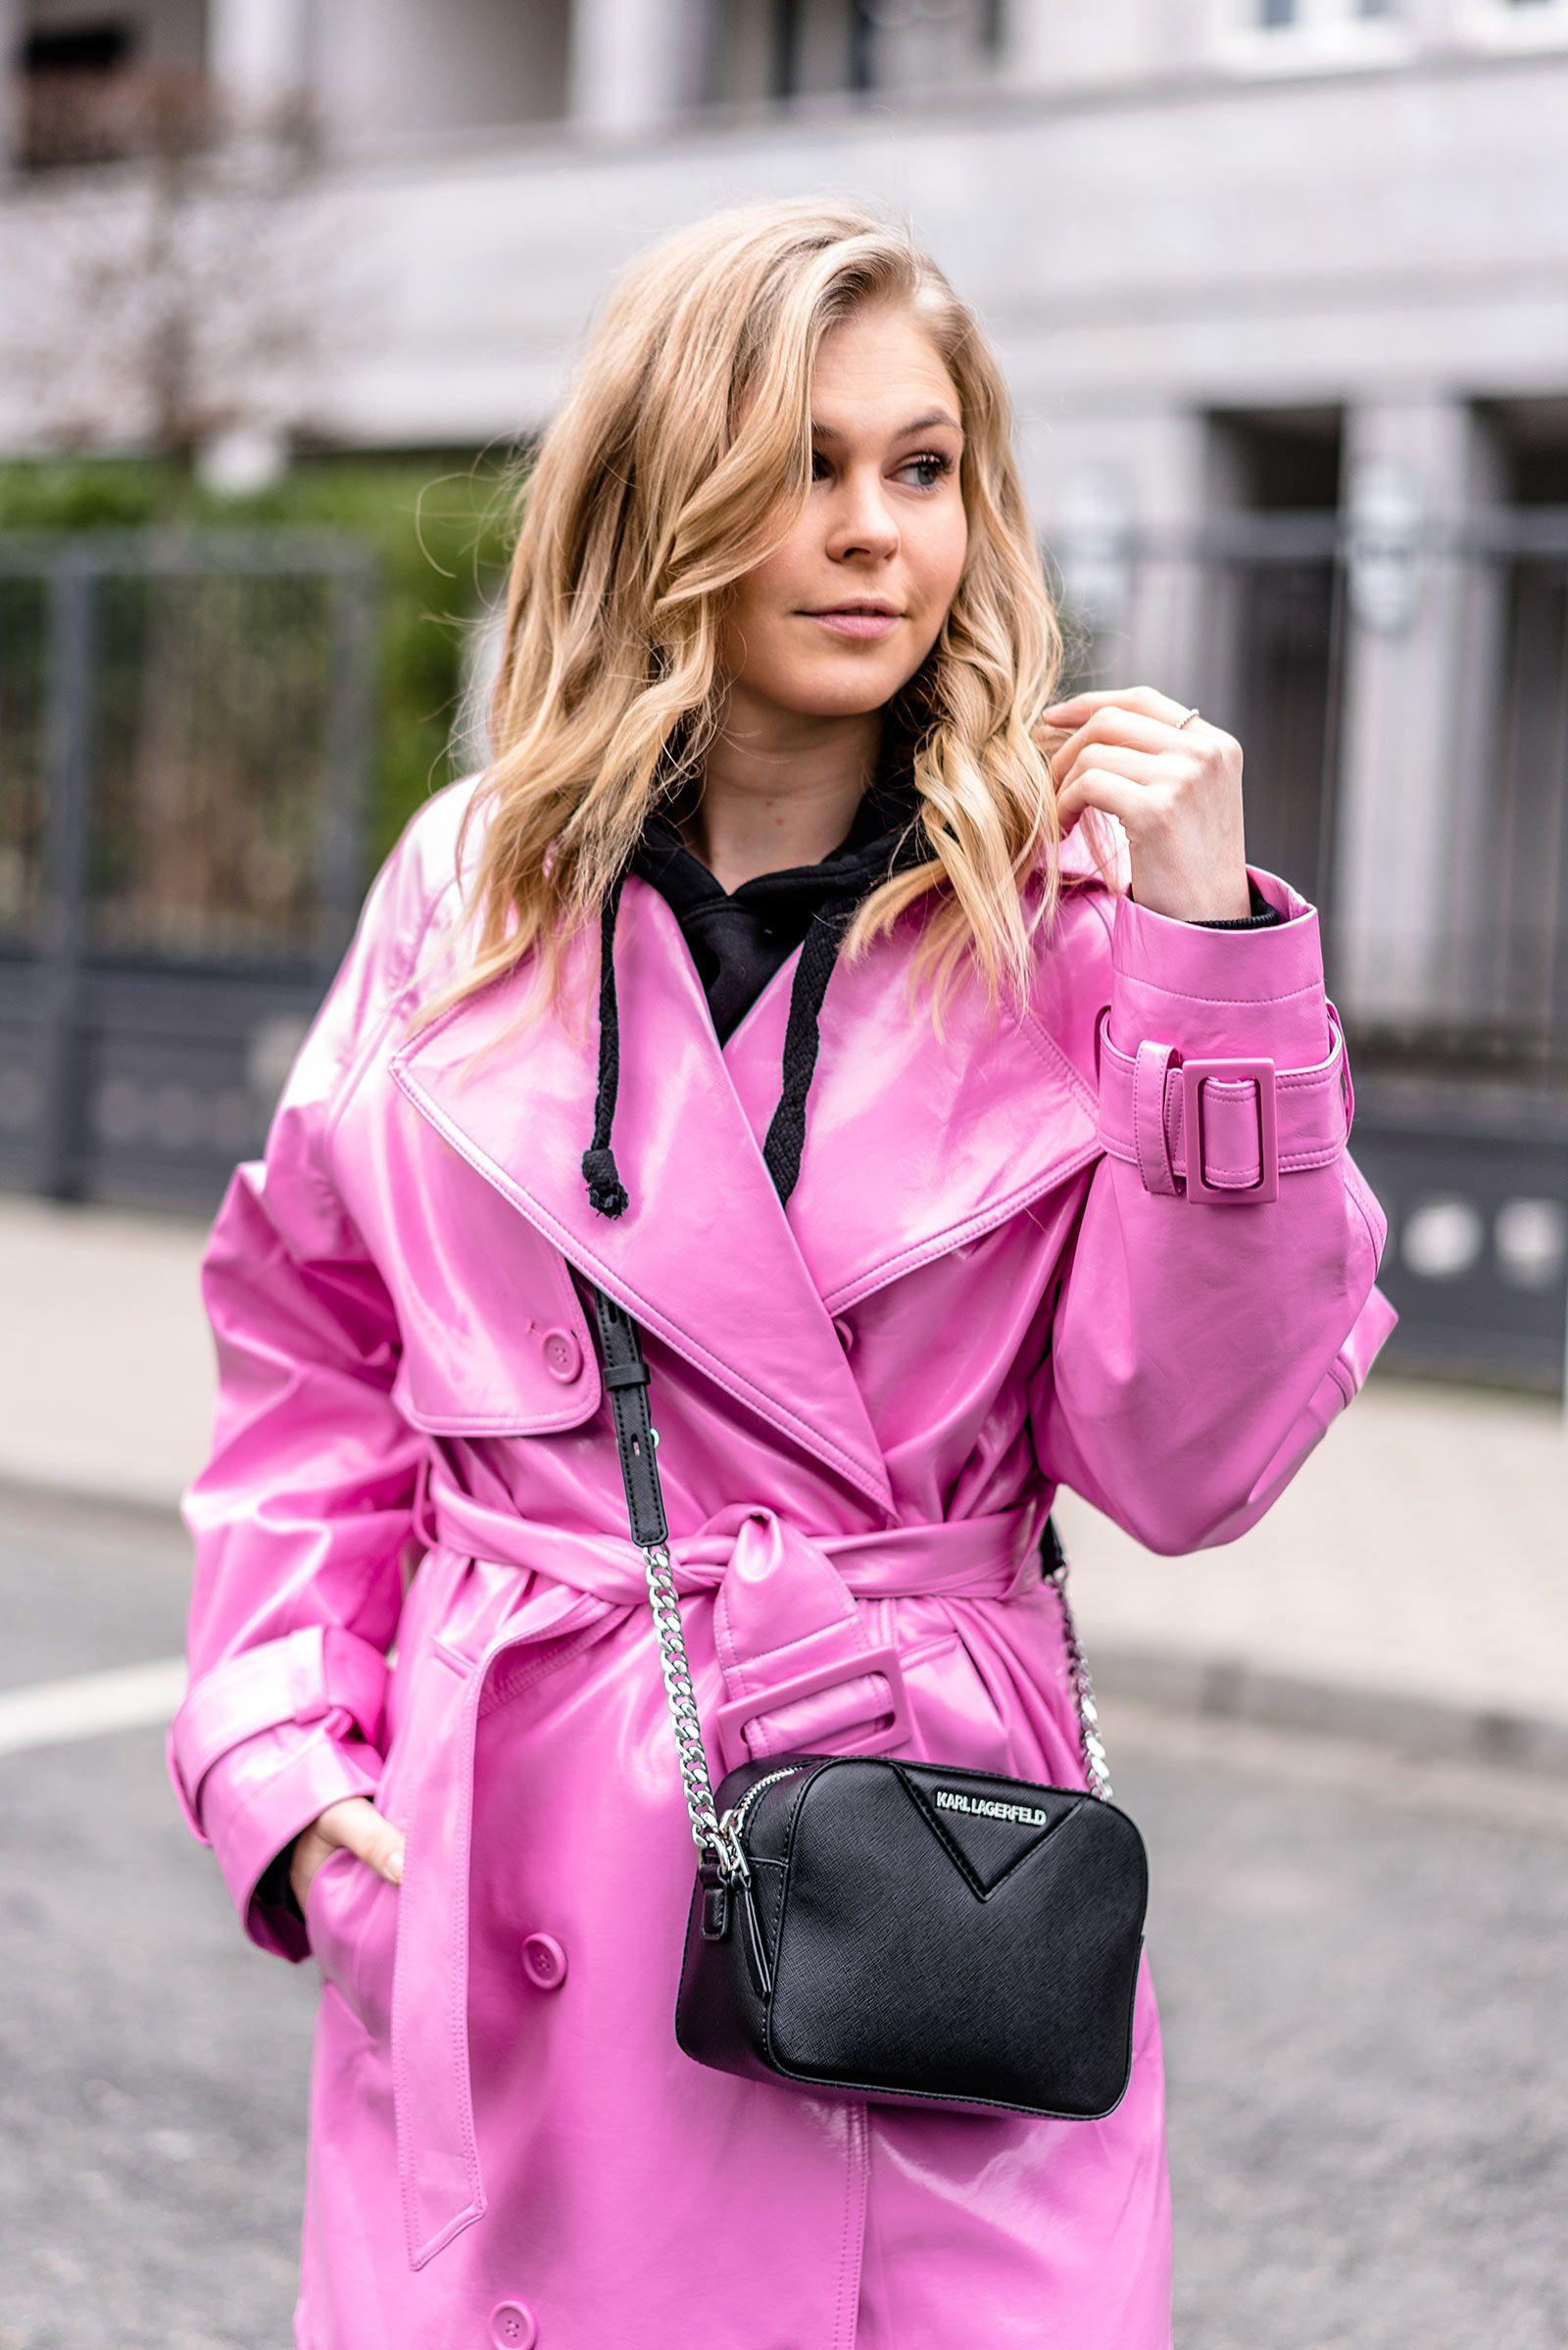 b1c41115507c93 Outfit  Vinyl Trenchcoat in Pink mit schwarzen Basics